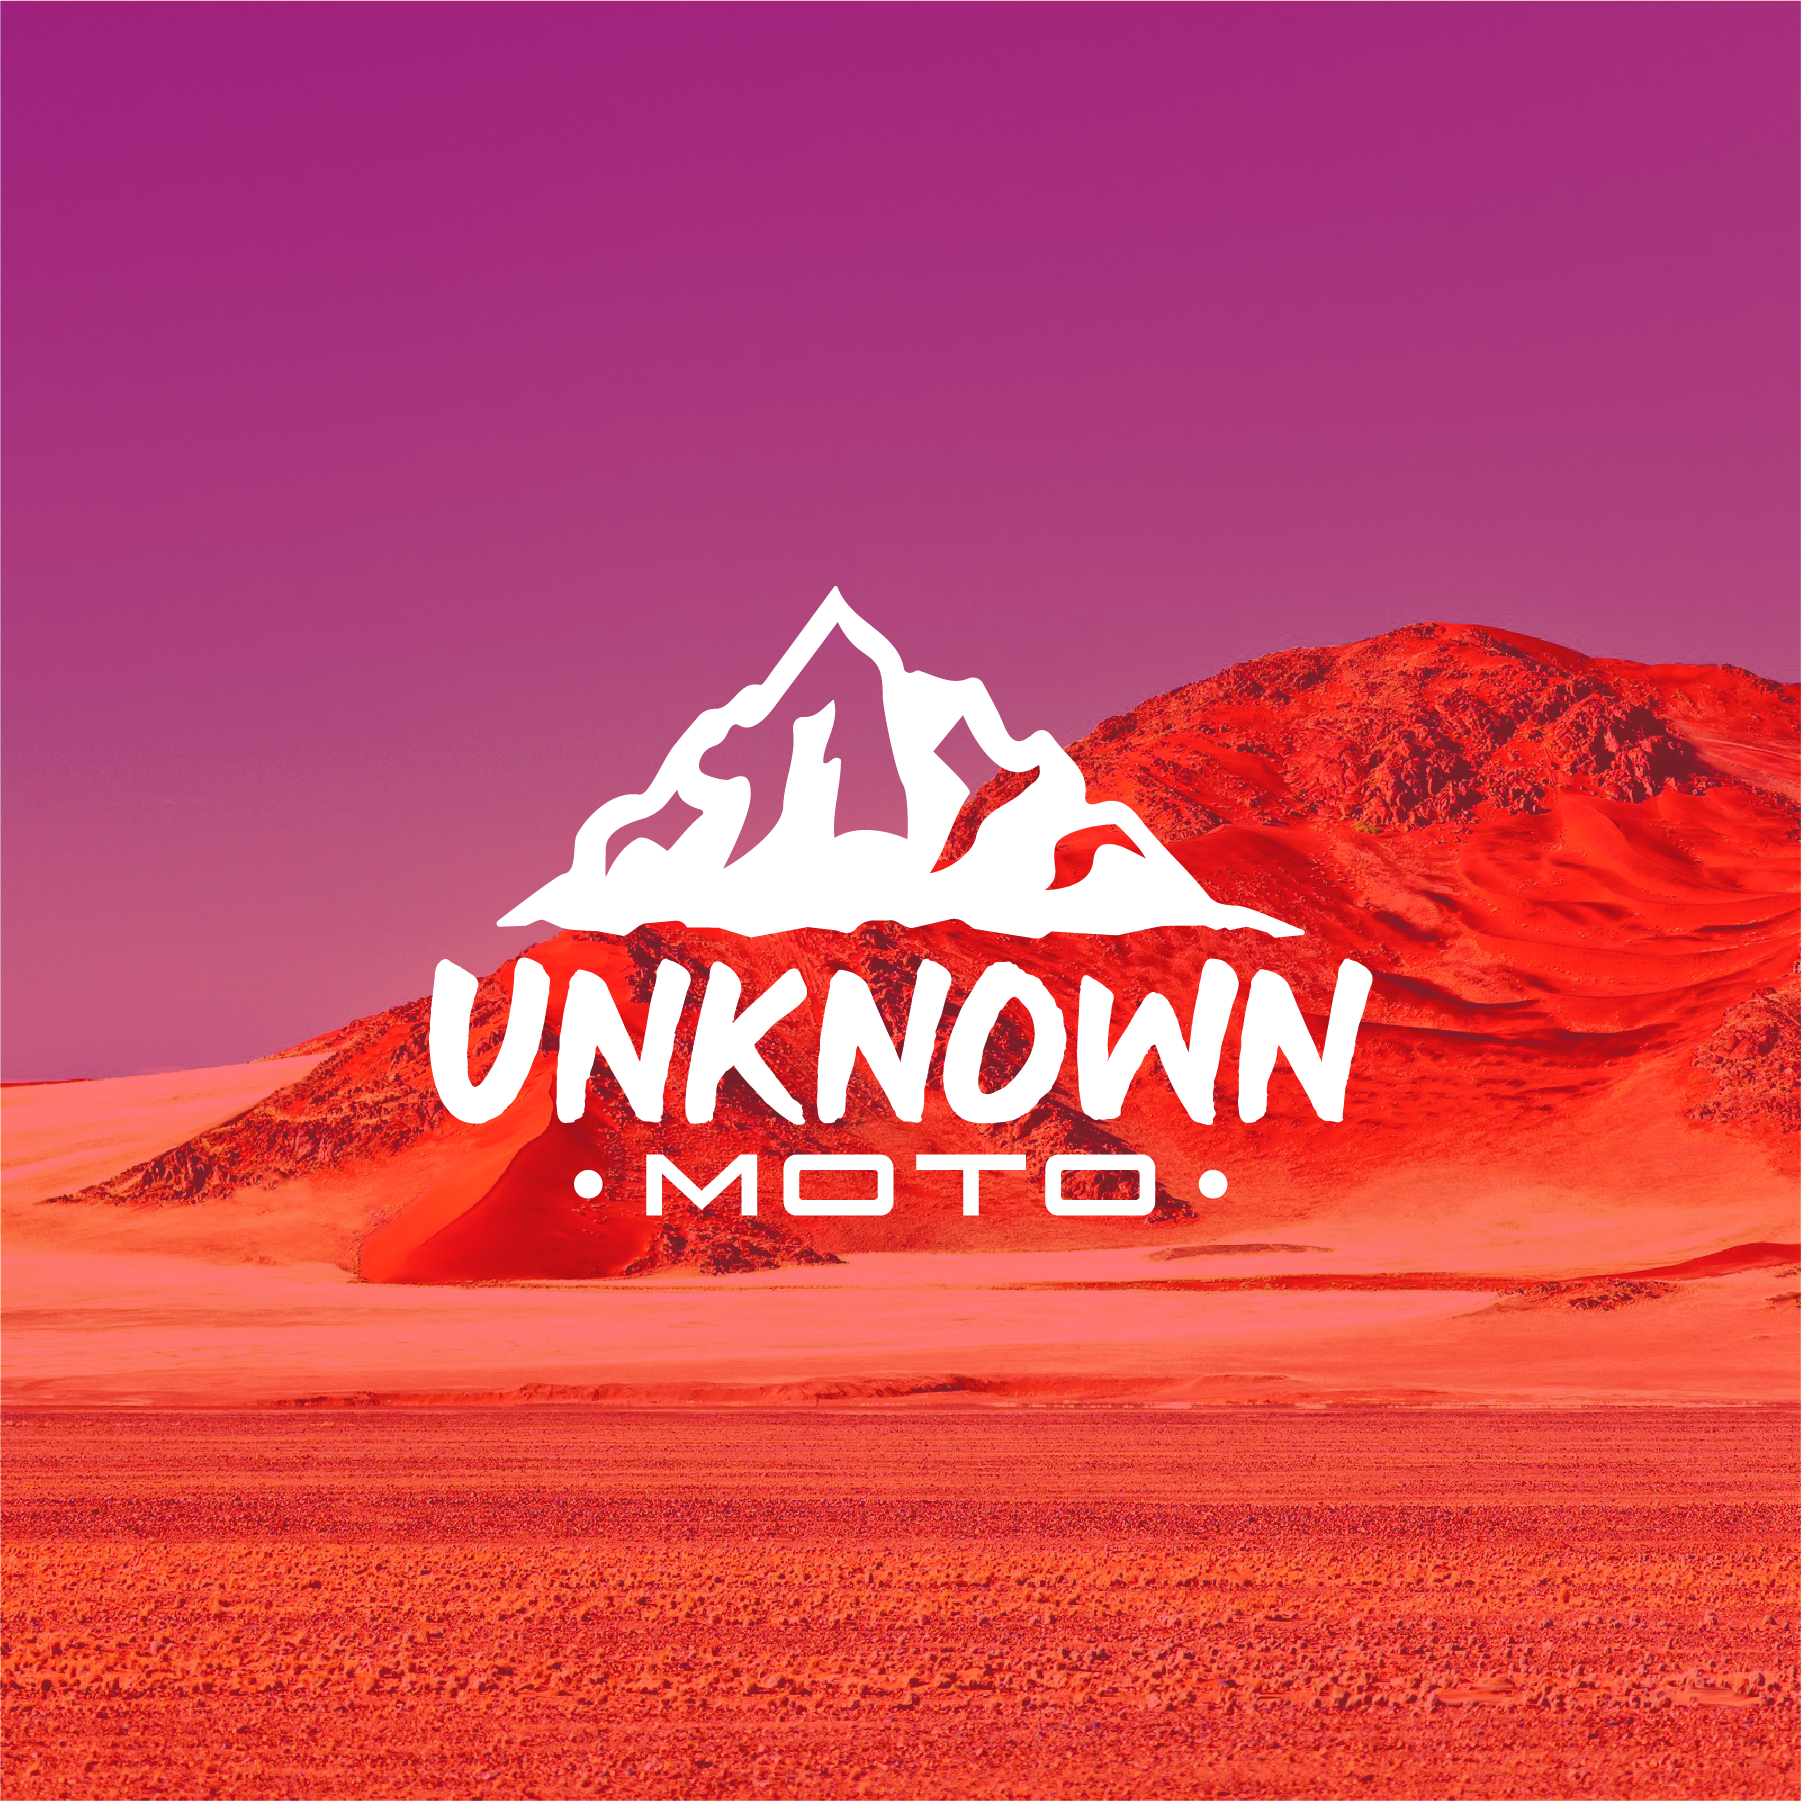 UnknownMoto_Logo (3)-01.jpg